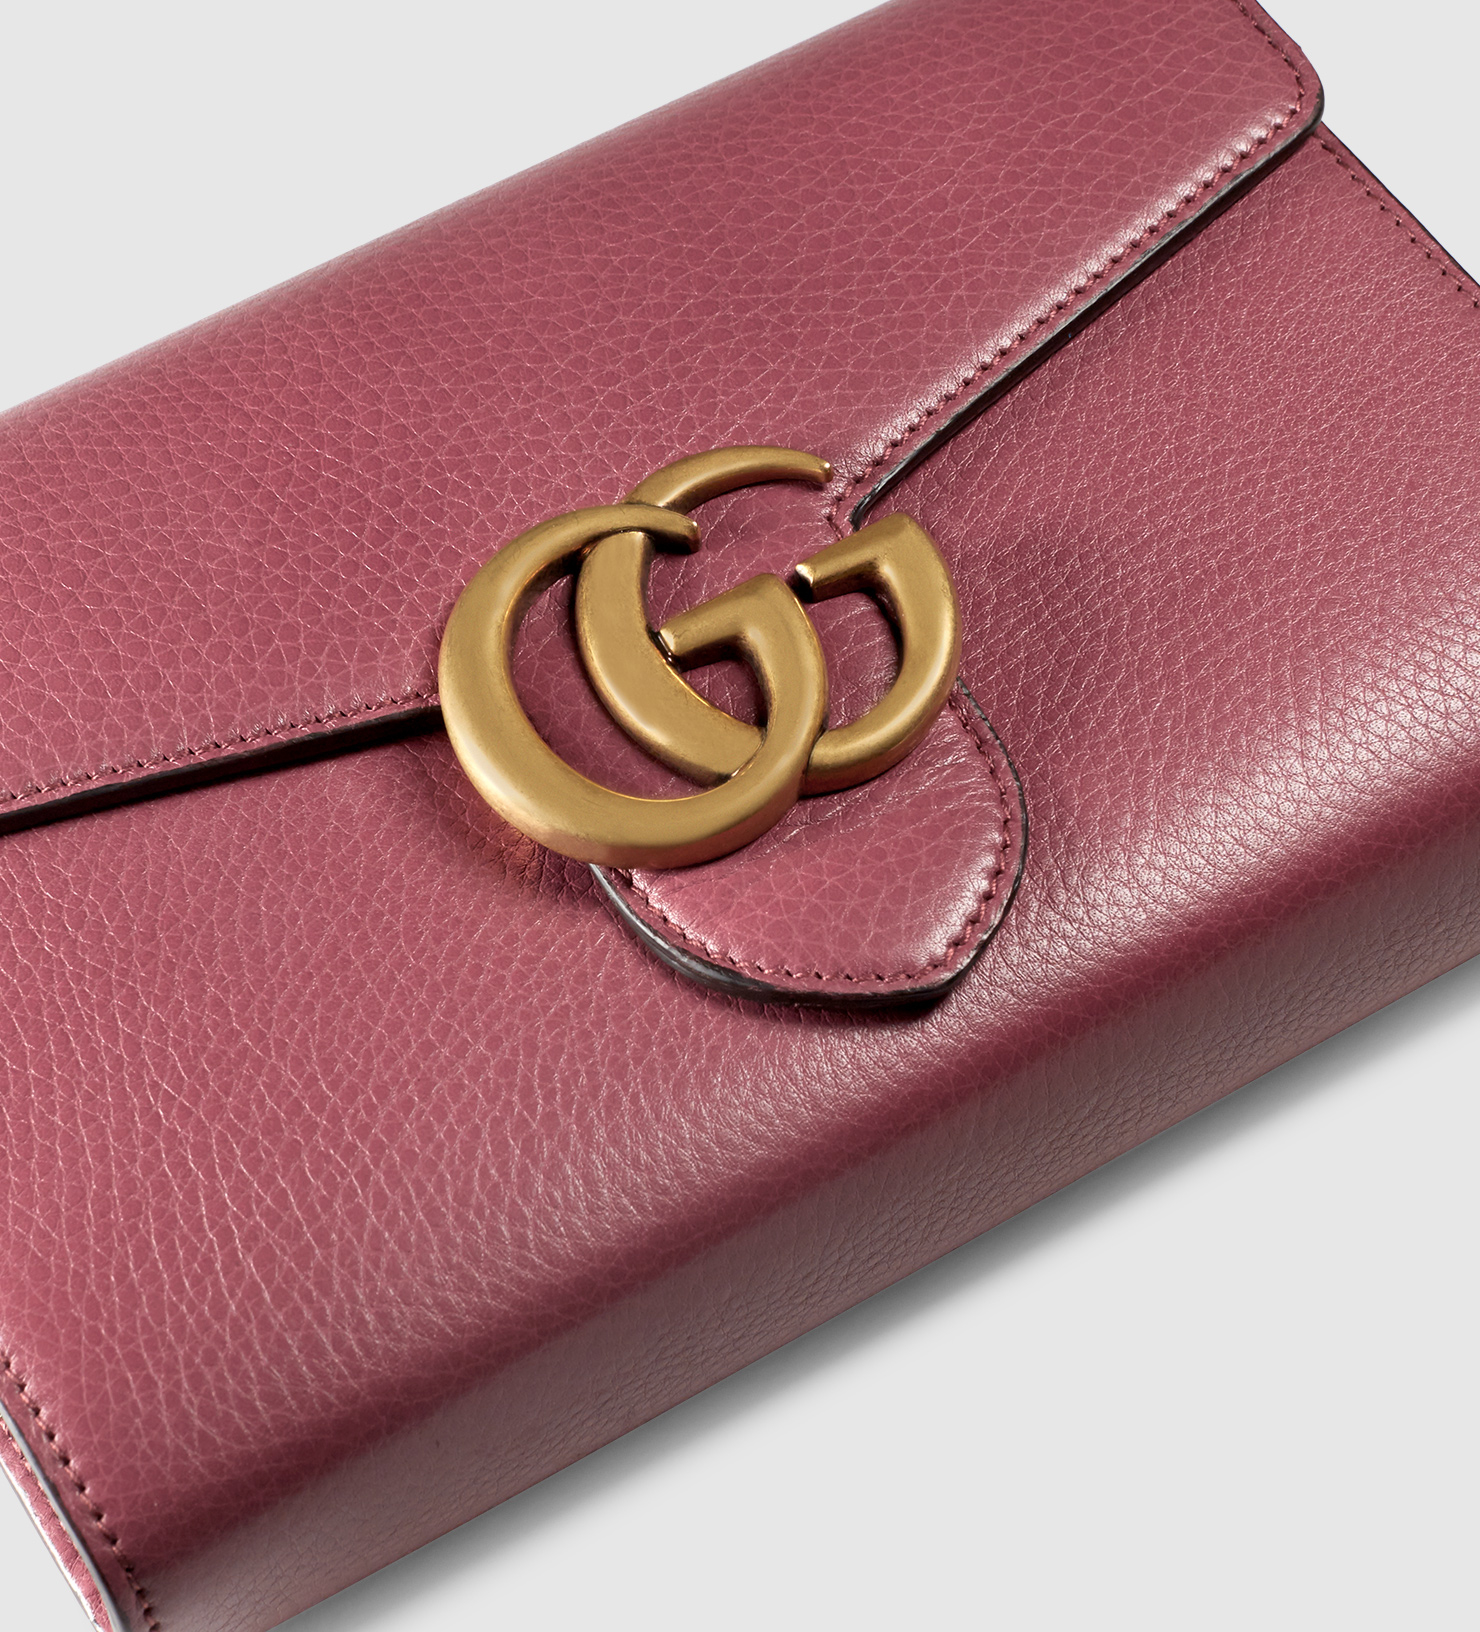 2957676da Gucci Gg Marmont Leather Chain Wallet in Purple - Lyst